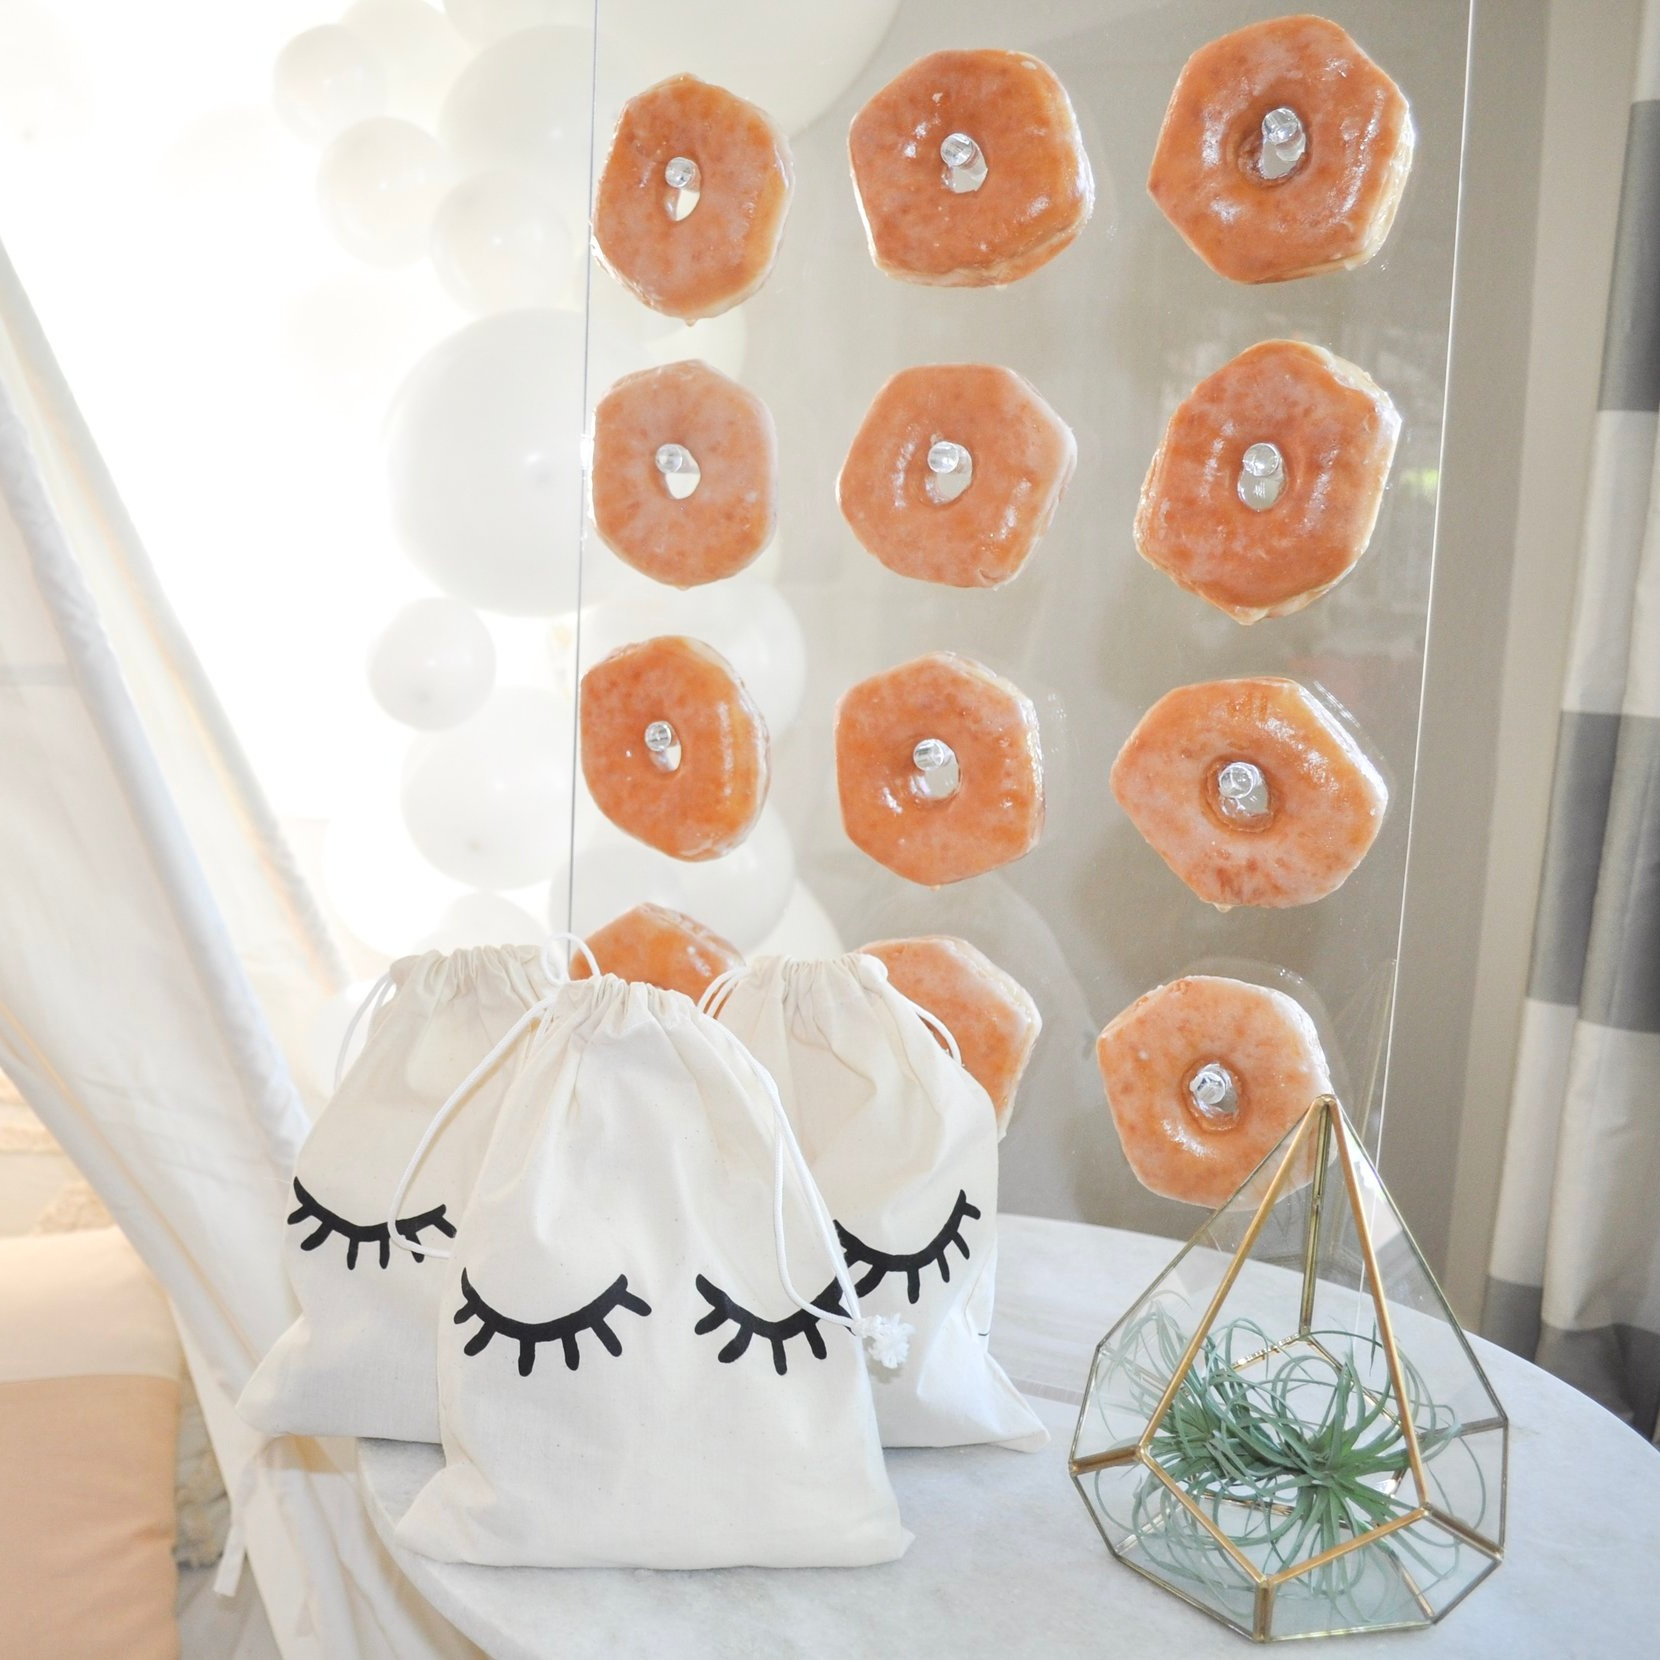 donut wall | $10 rental